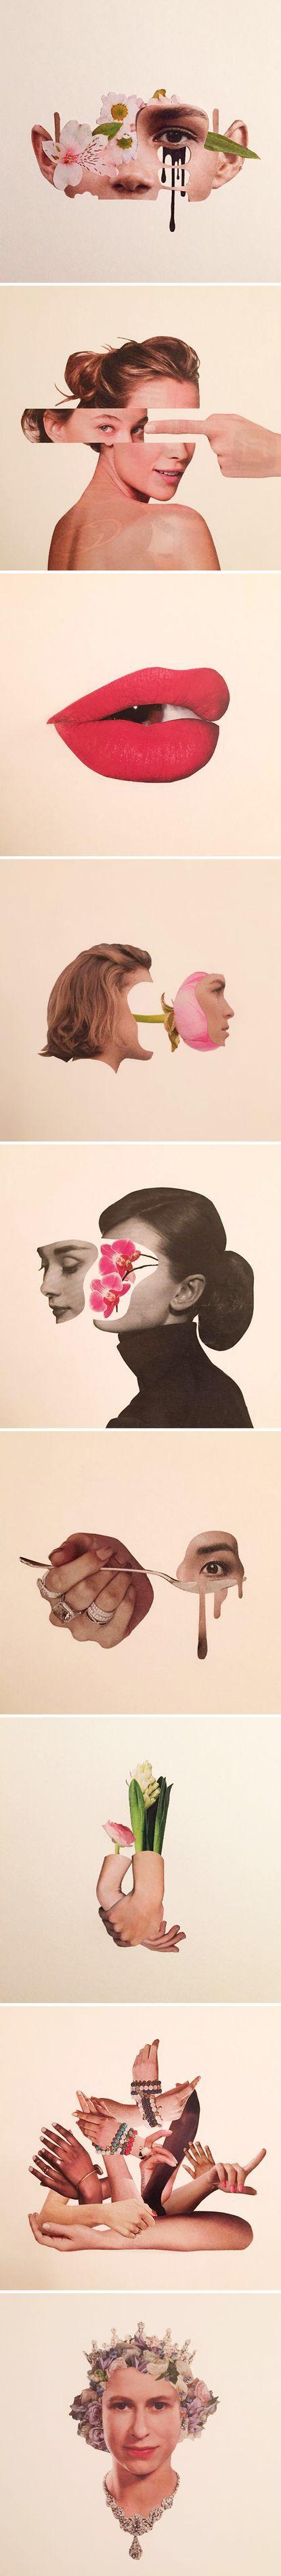 adam hale aka mr.splice #collage #art